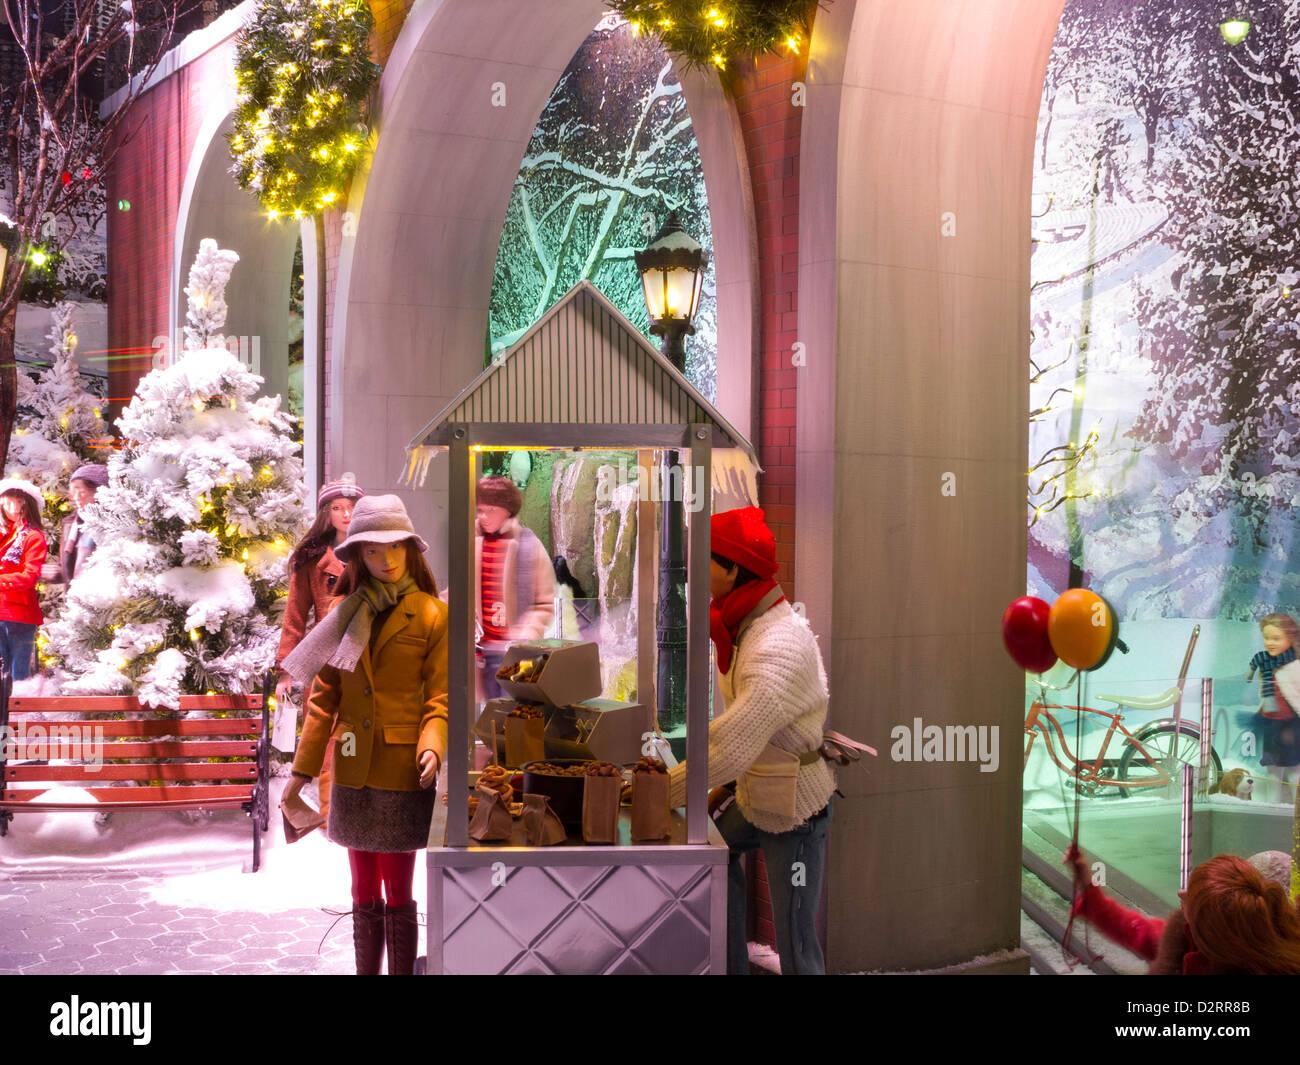 Christmas Window, Lord & Taylor , NYC Stock Photo: 53383579 - Alamy